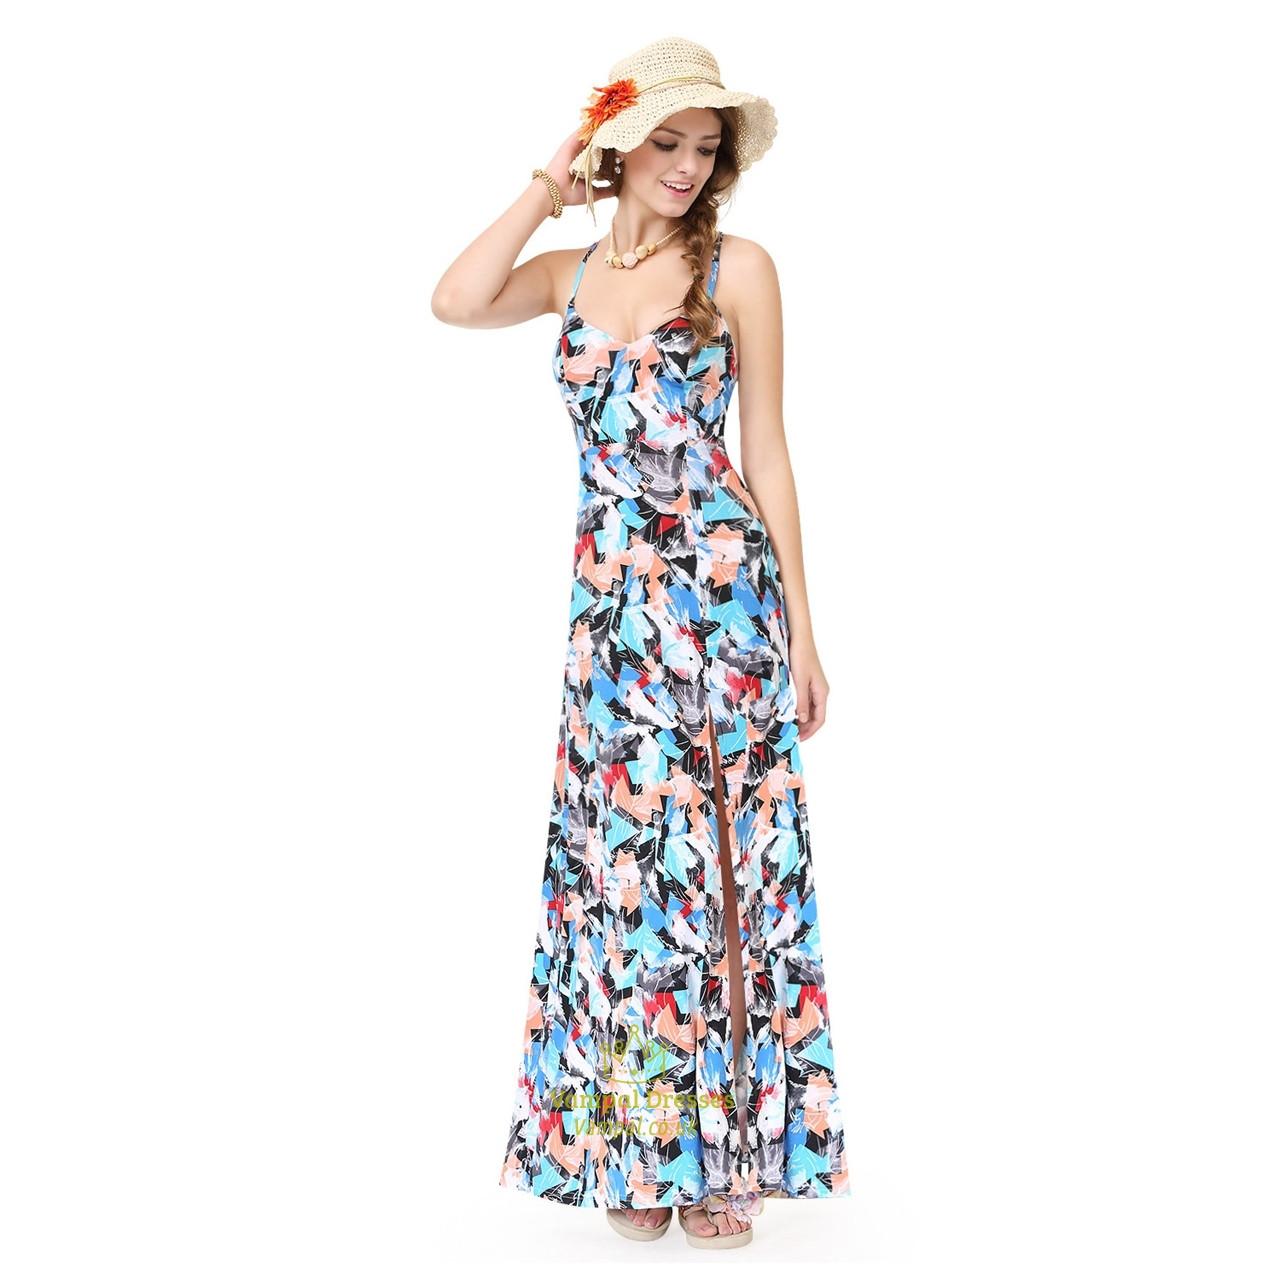 Spaghetti Strap Summer Dress  Colorful Spaghetti Strap Side Split Summer Dress With